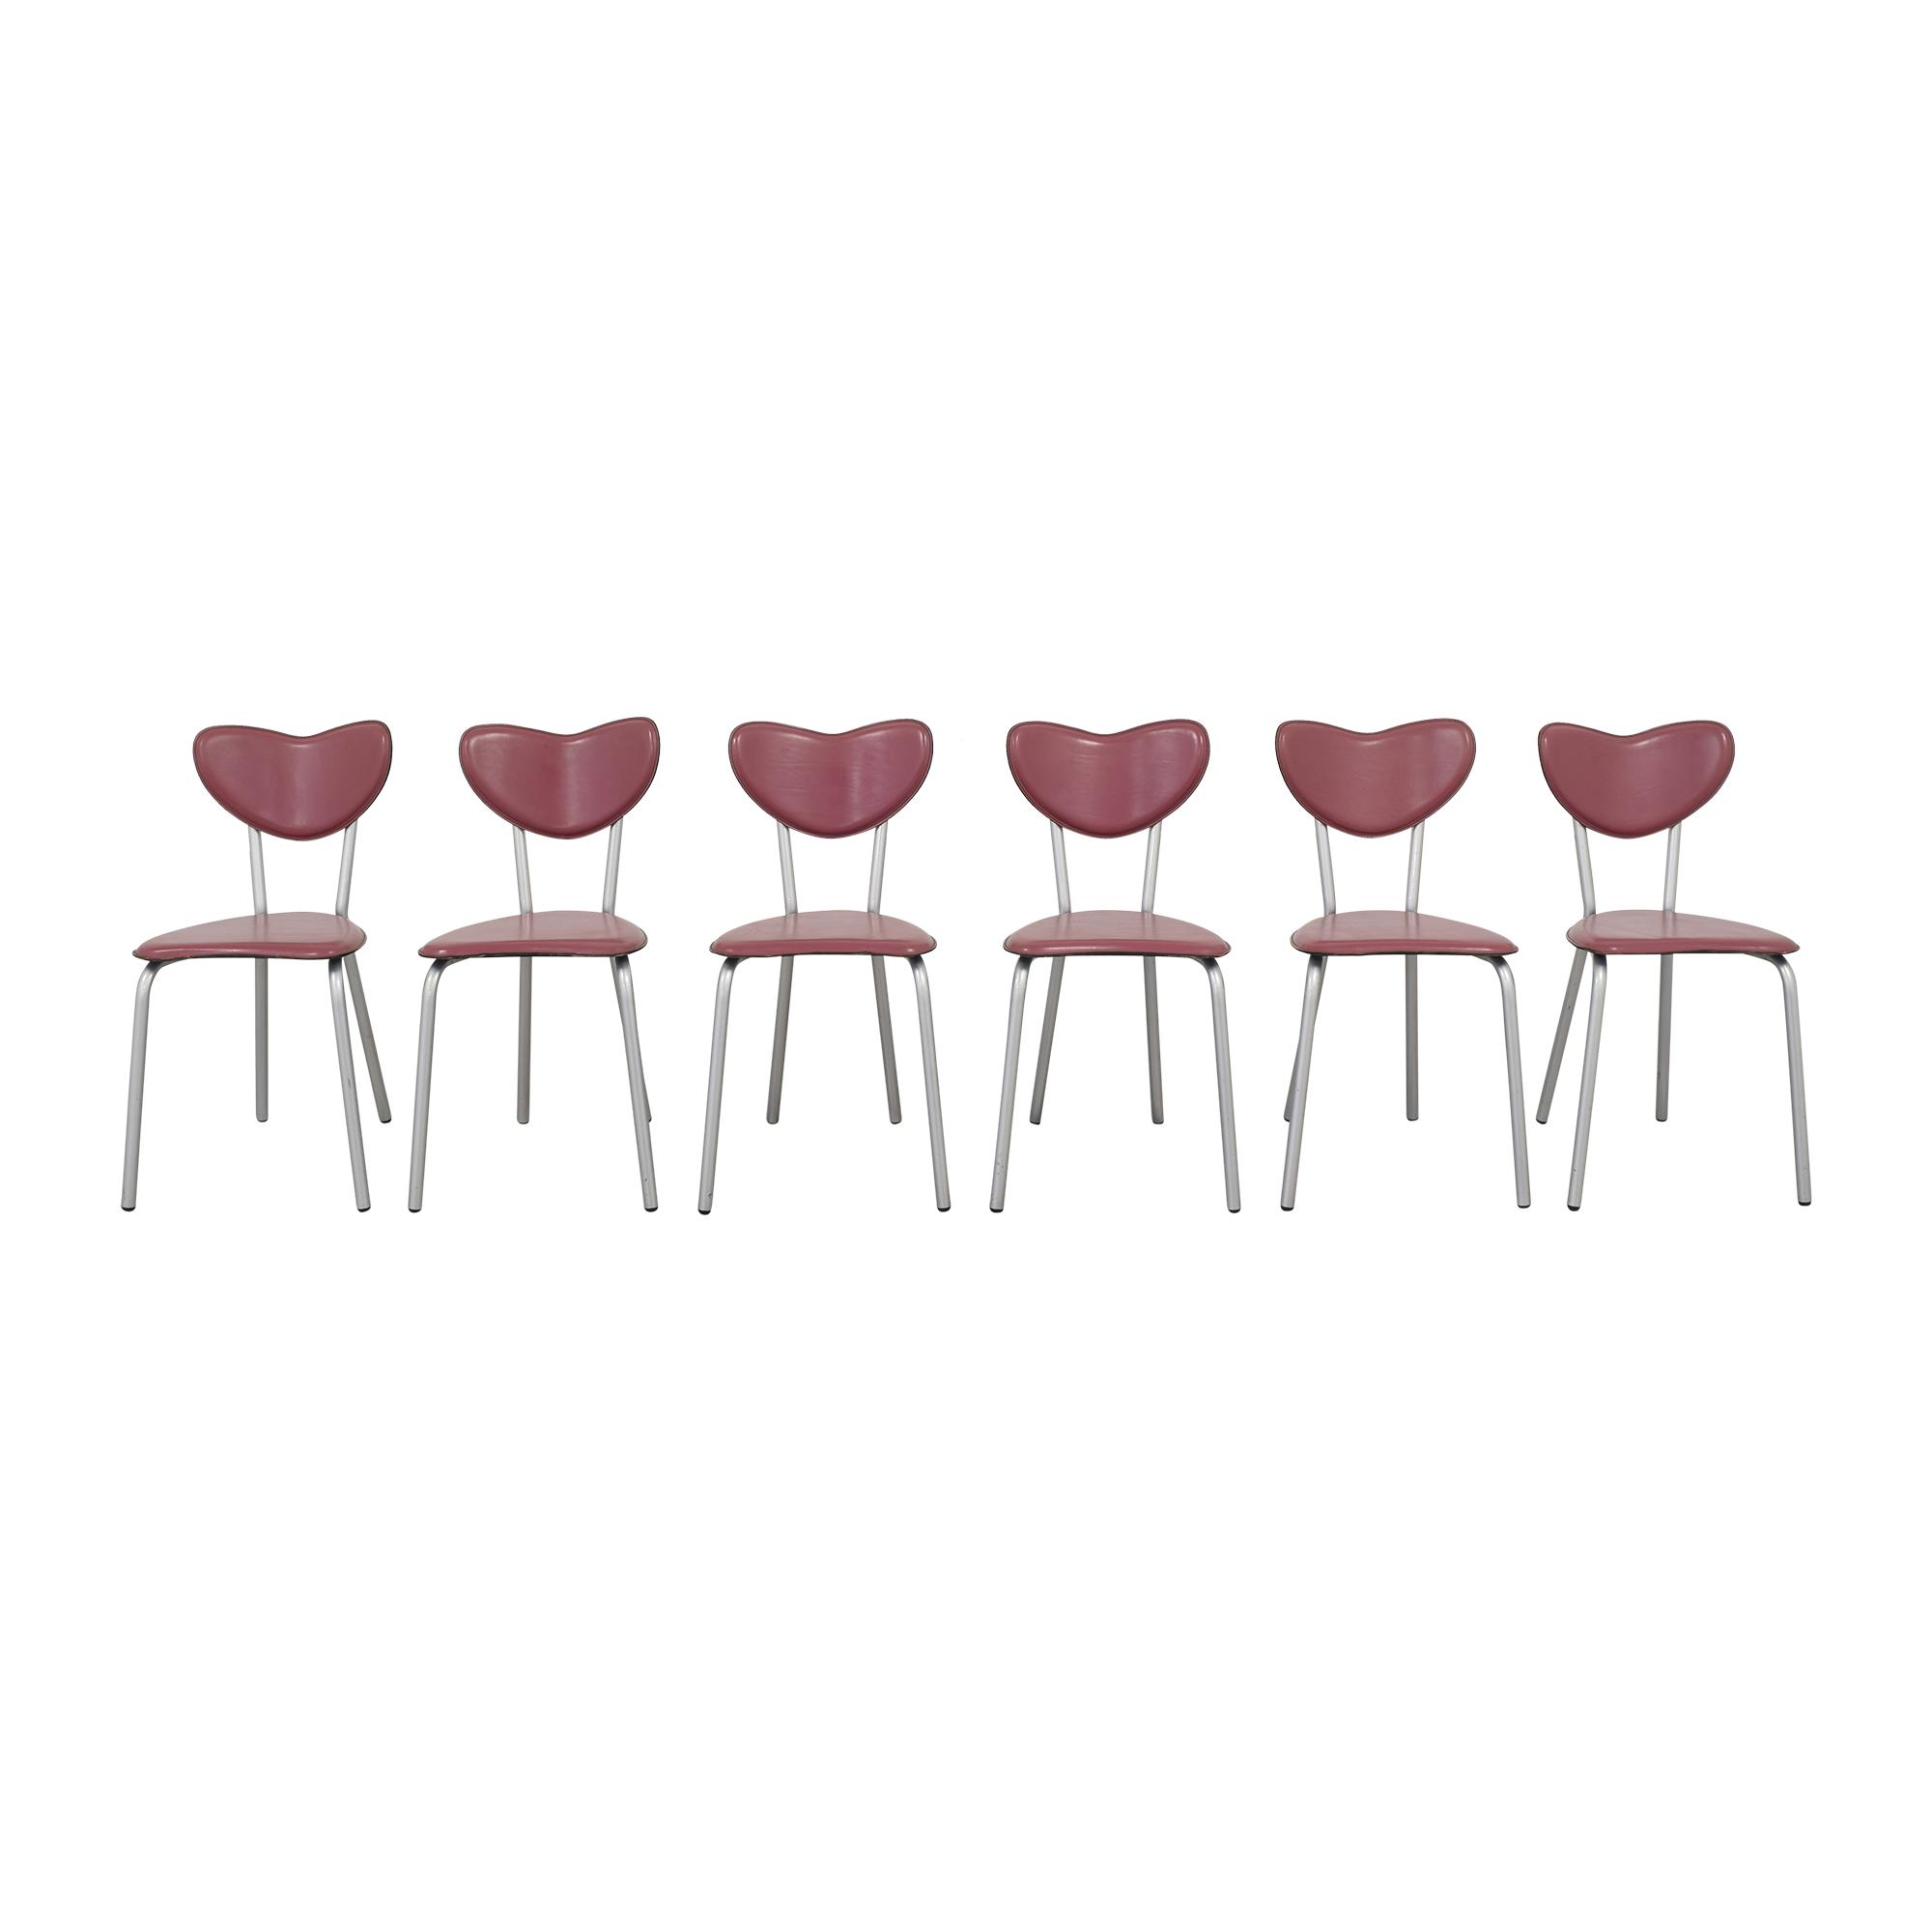 Pellizzoni Pellizzoni Modern Dining Chairs nyc